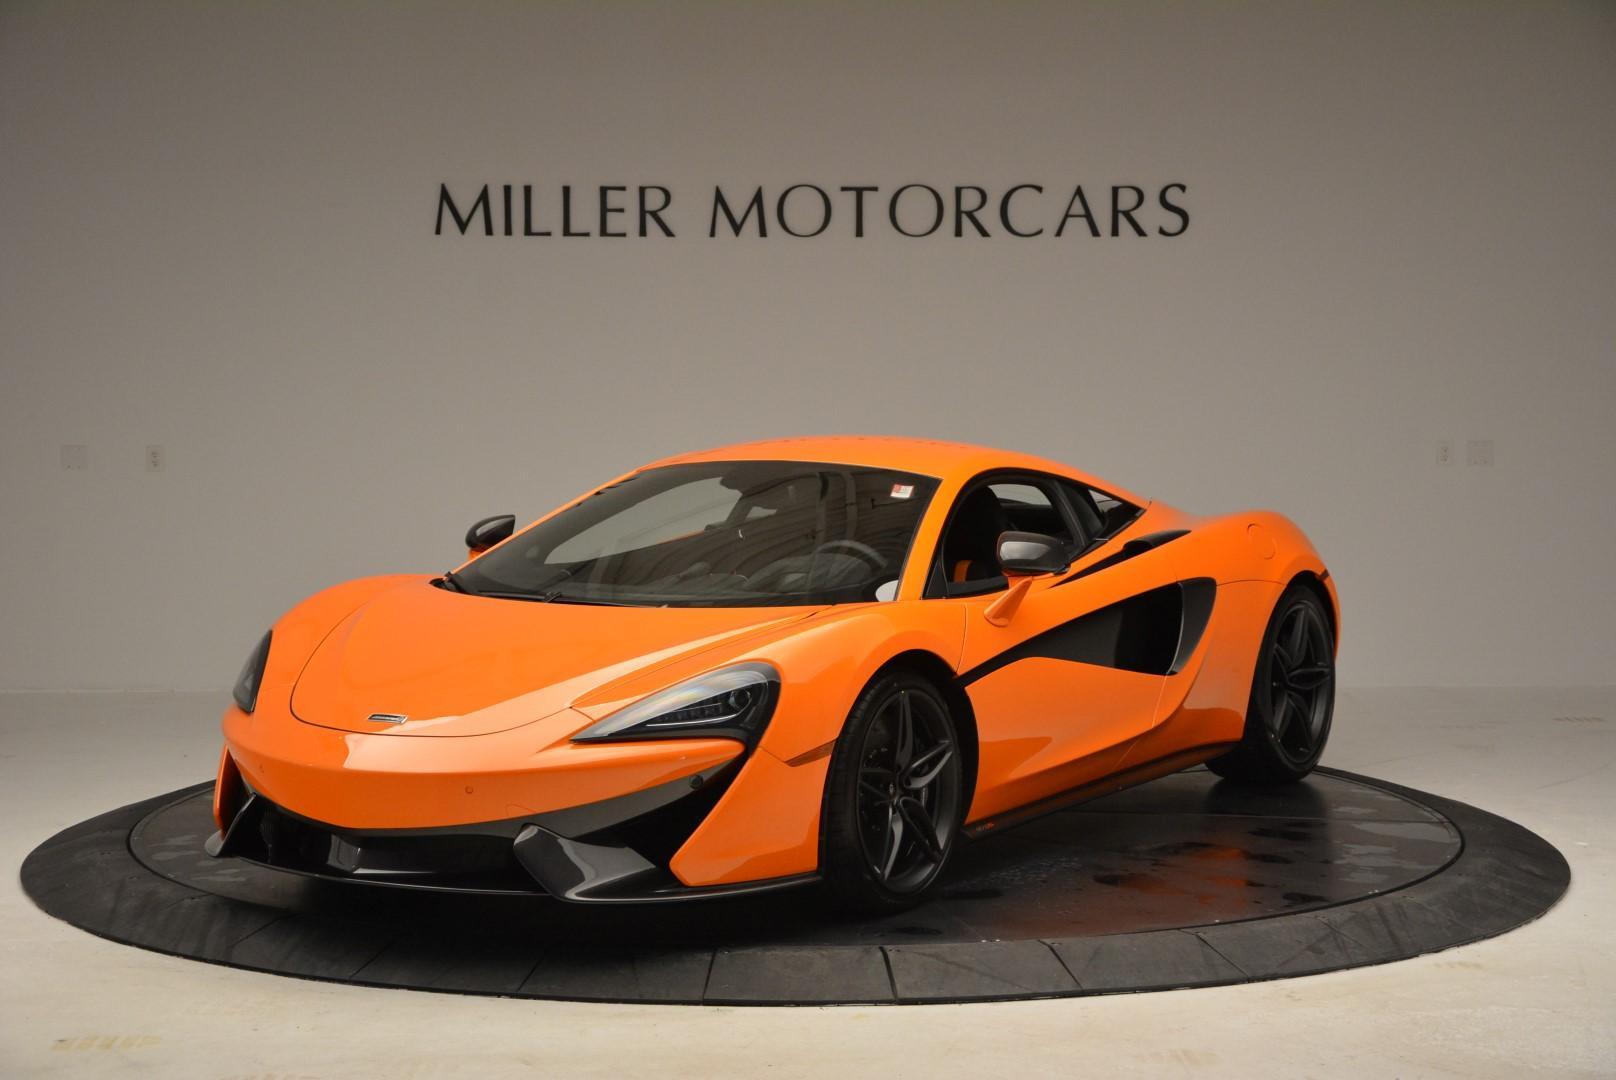 Used 2016 McLaren 570S for sale Sold at Alfa Romeo of Westport in Westport CT 06880 1